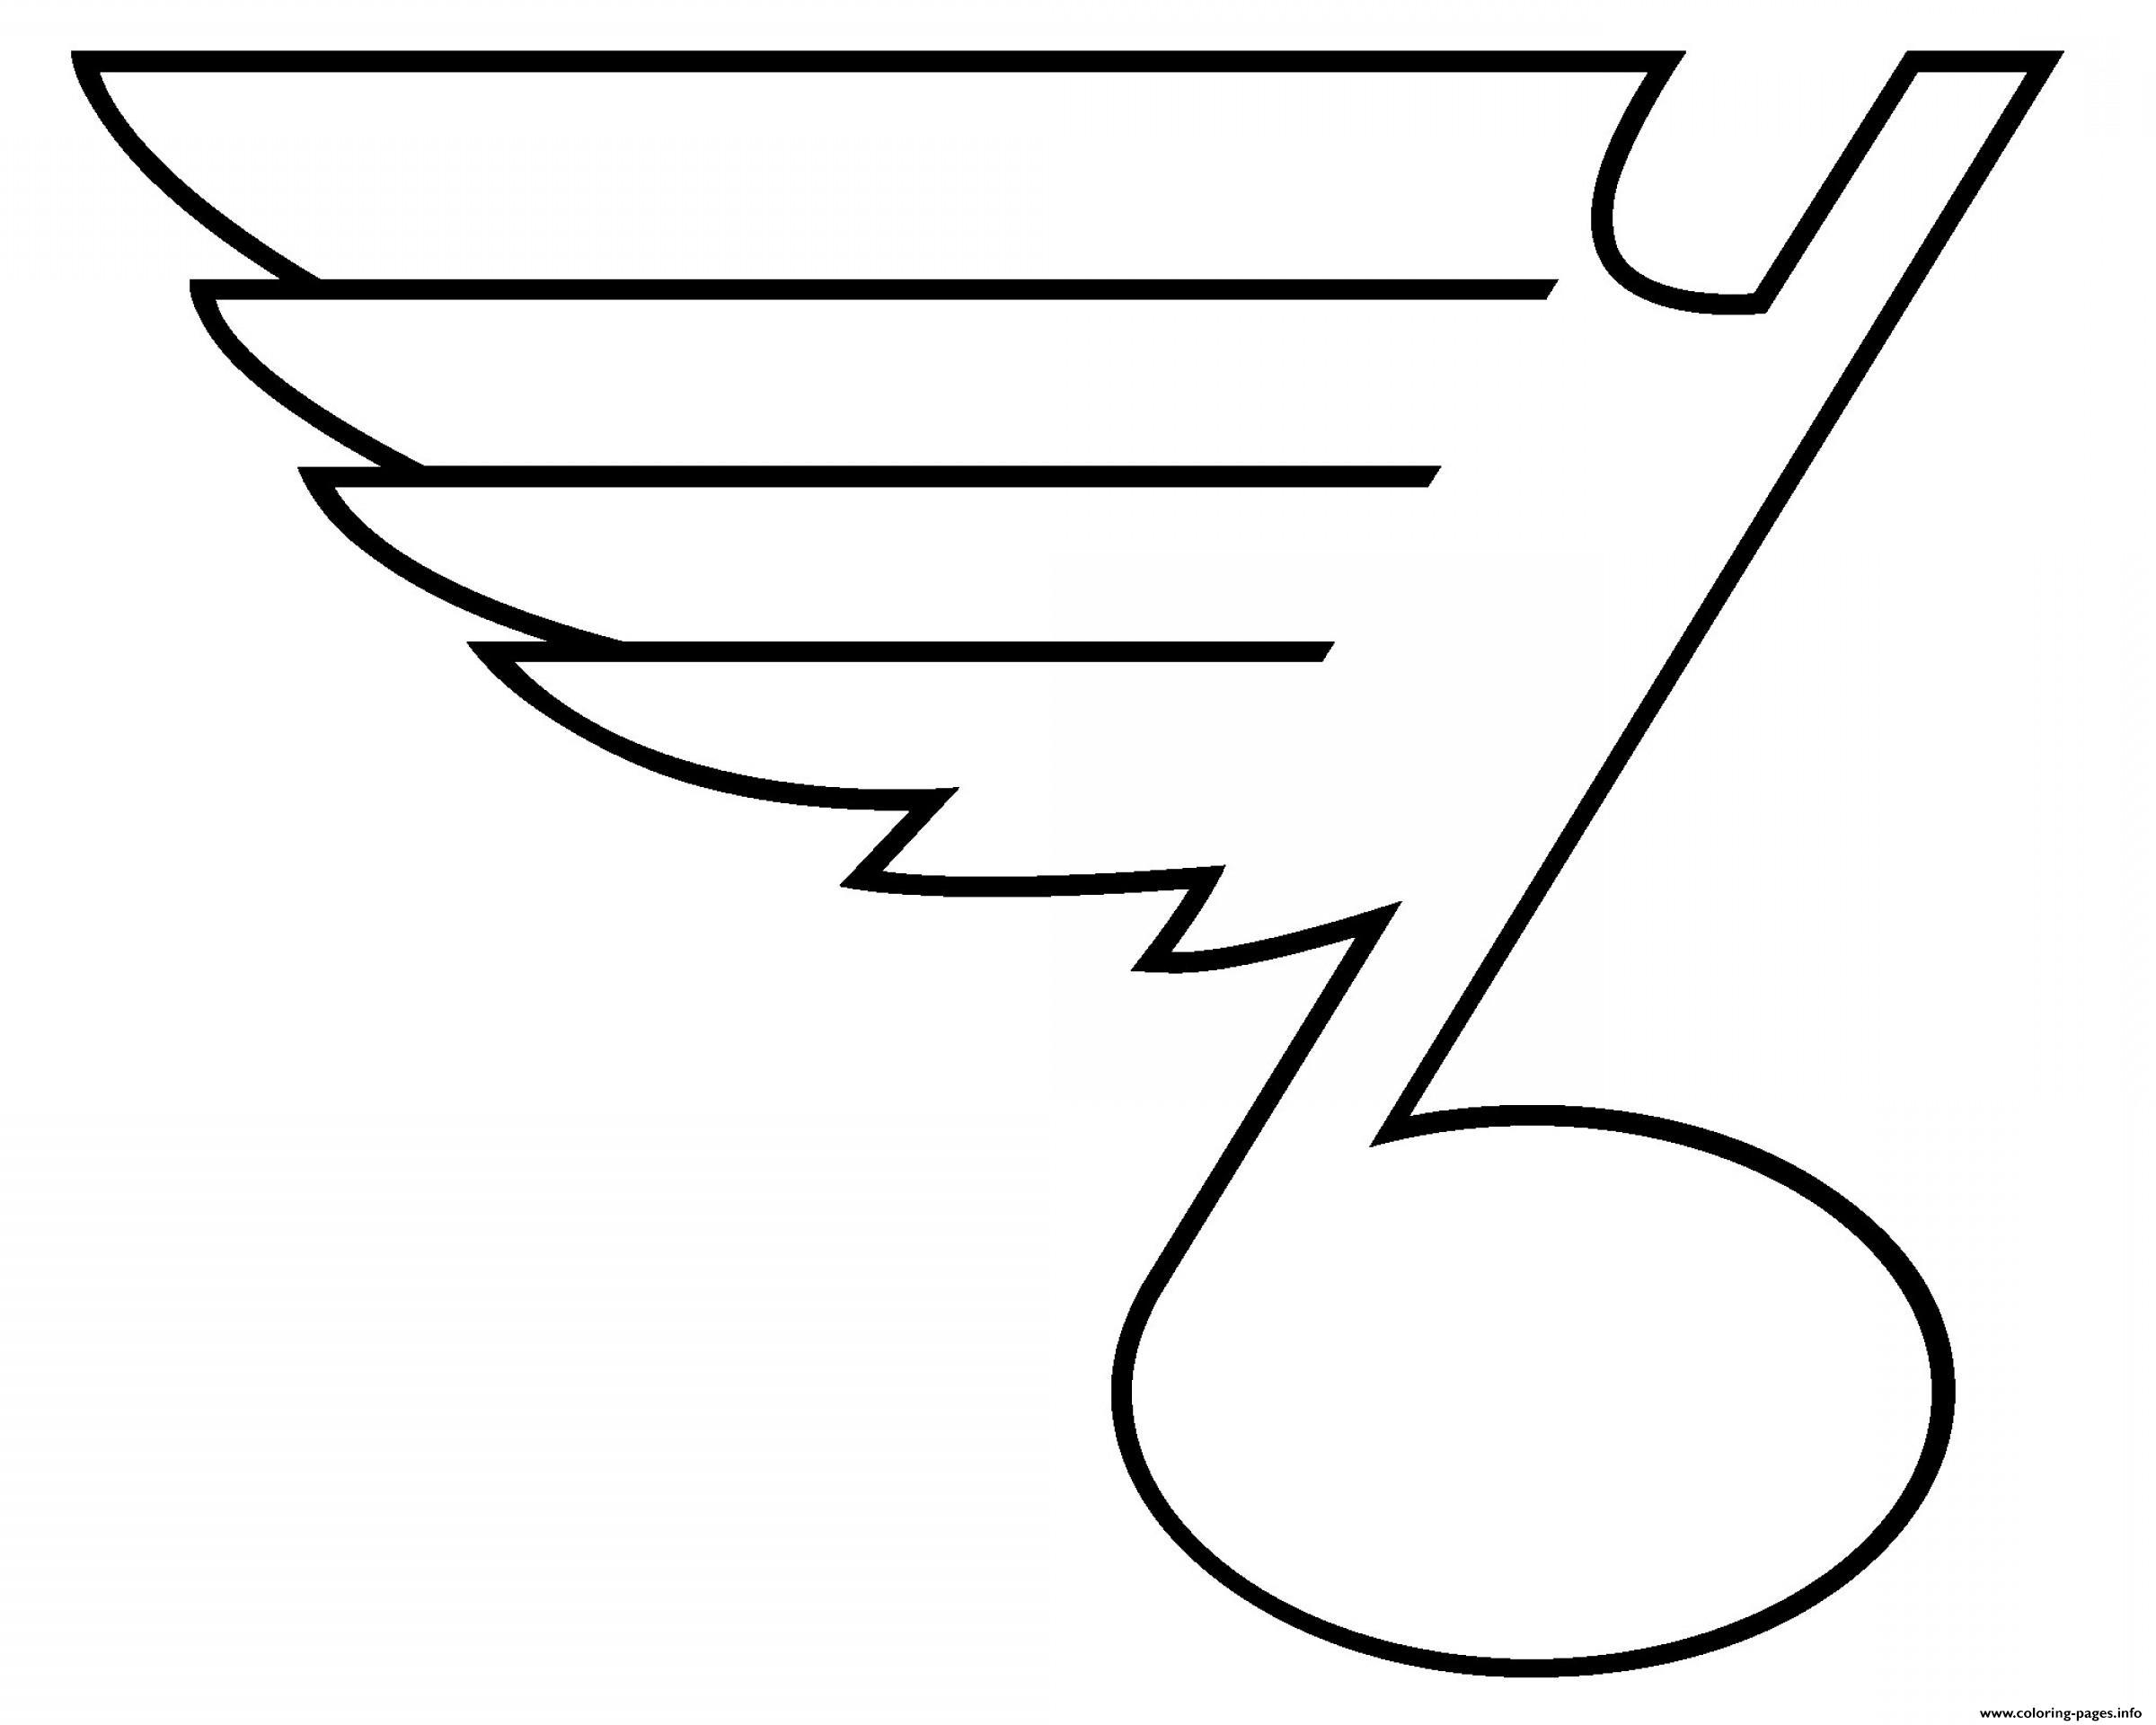 St louis blues nhl logo coloring pages printable